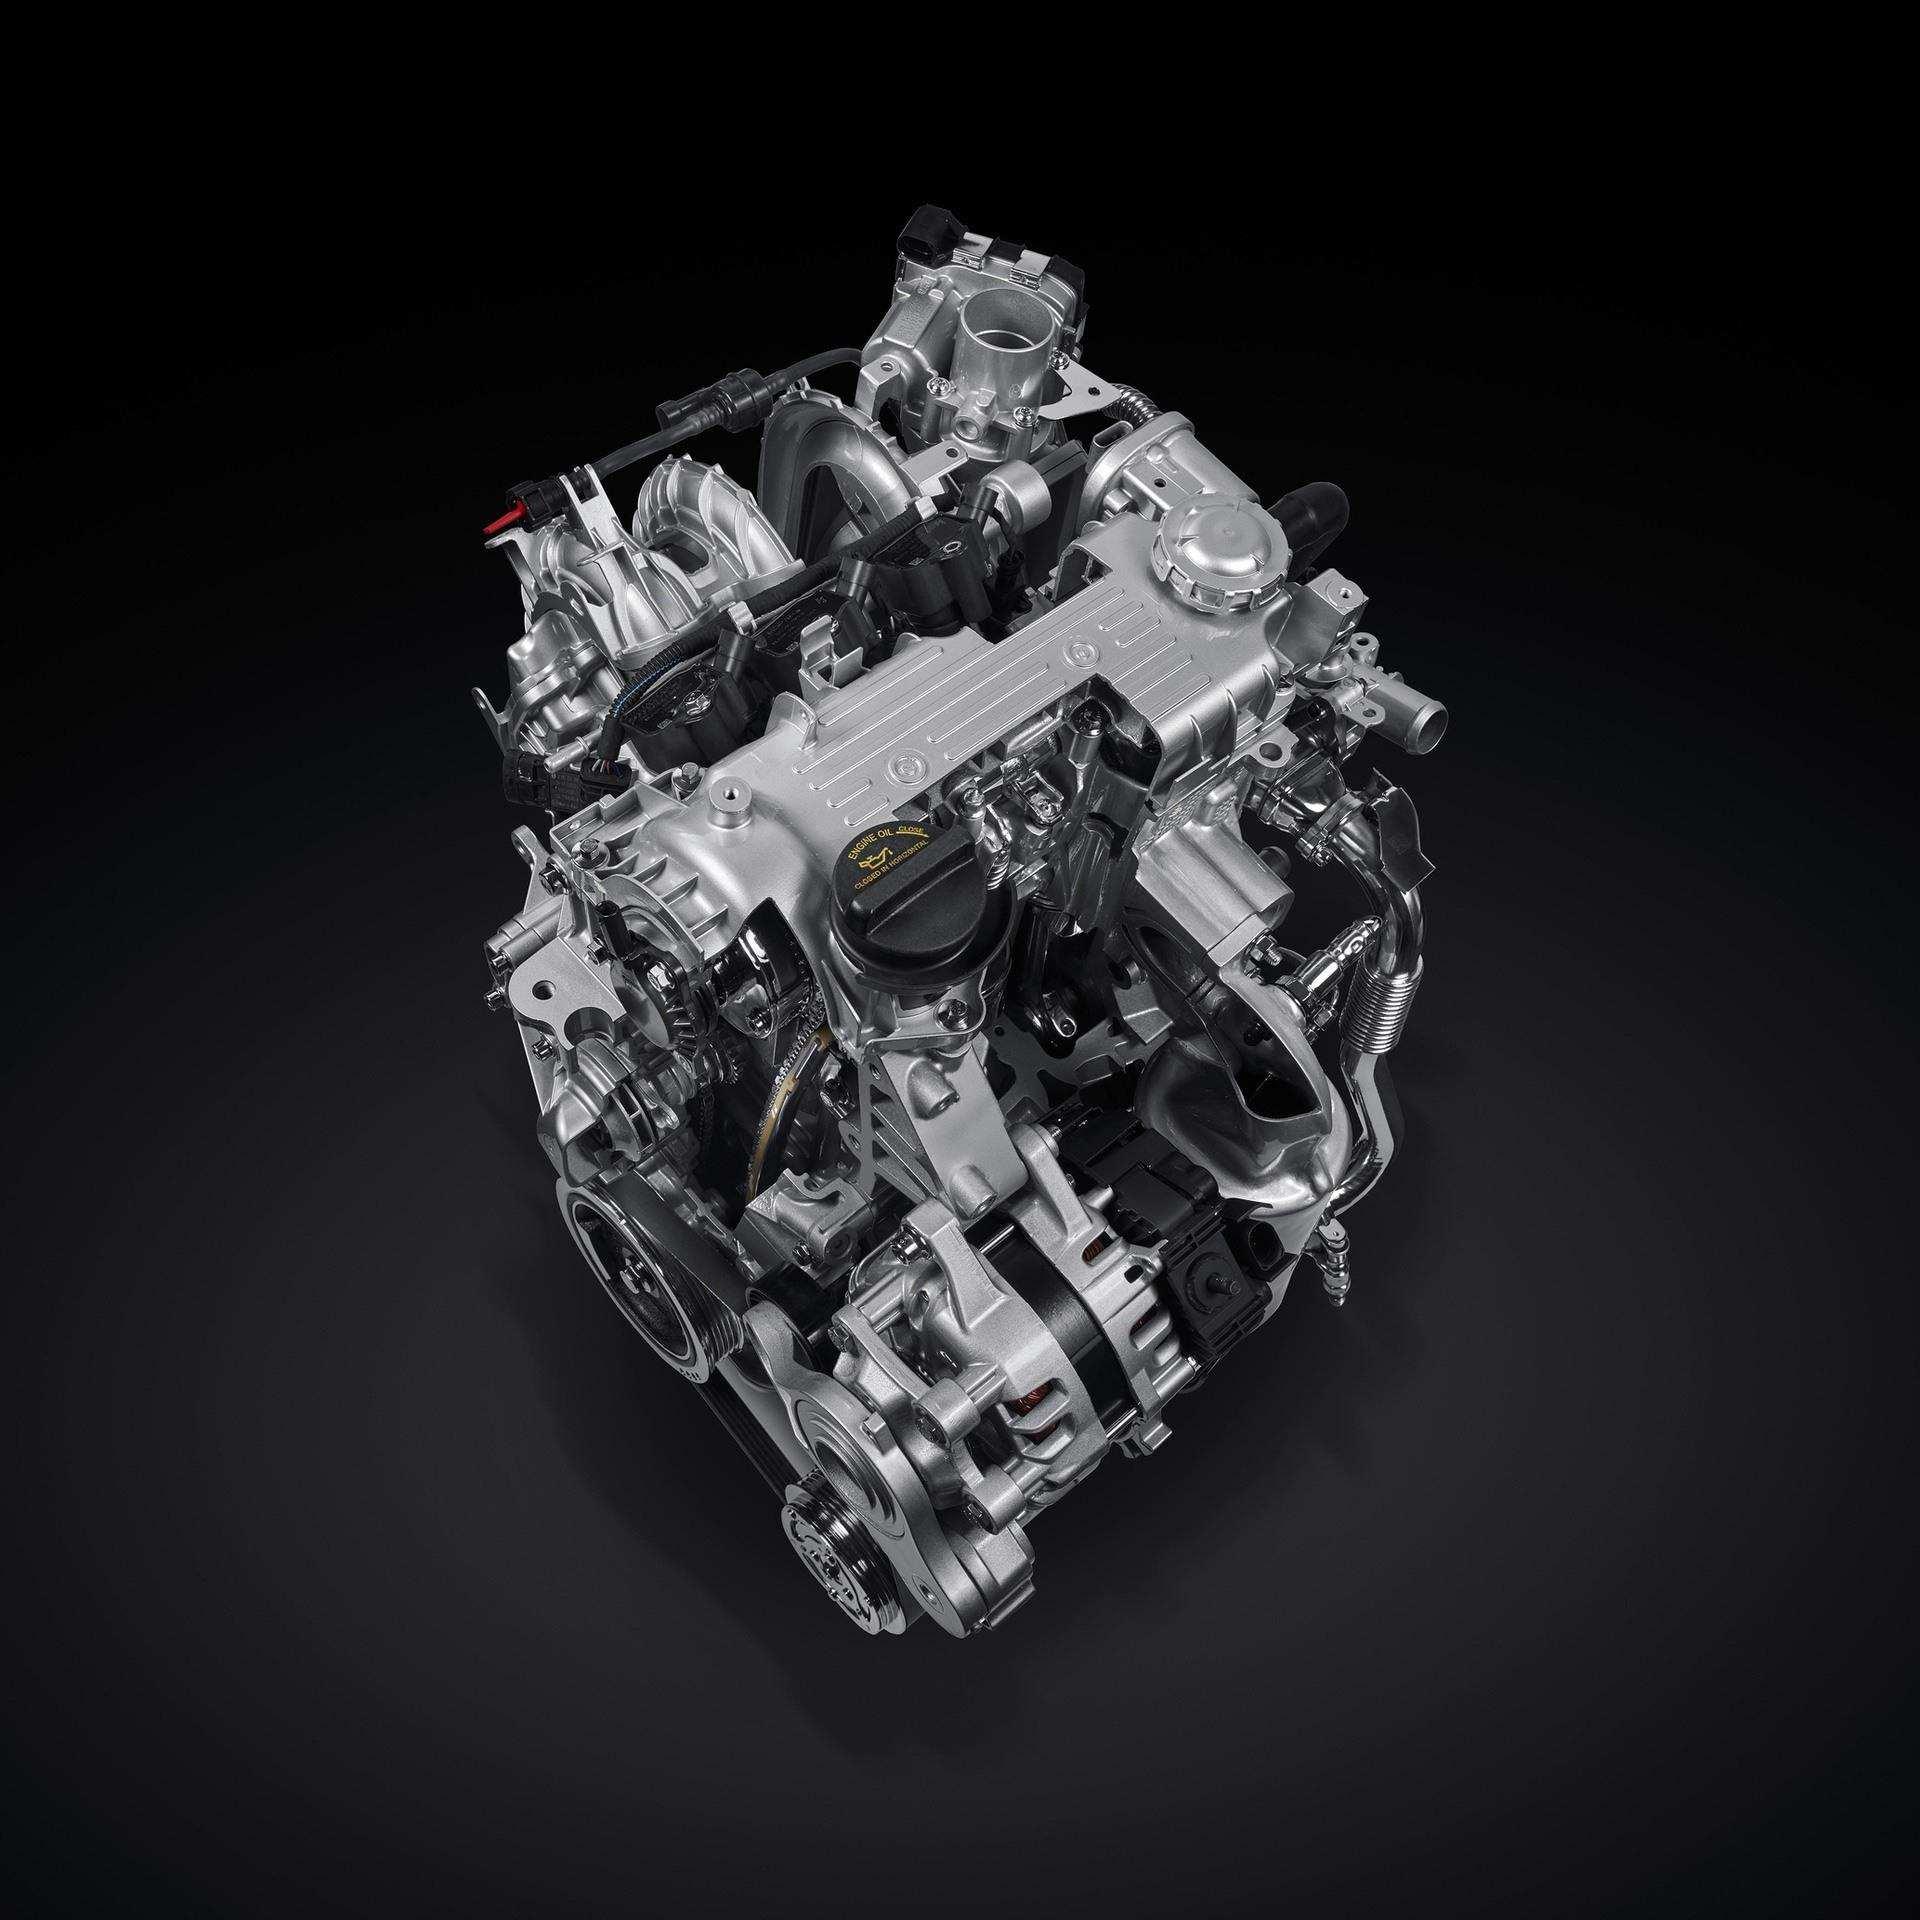 200108_Fiat_Mild-Hybrid-Engine_20